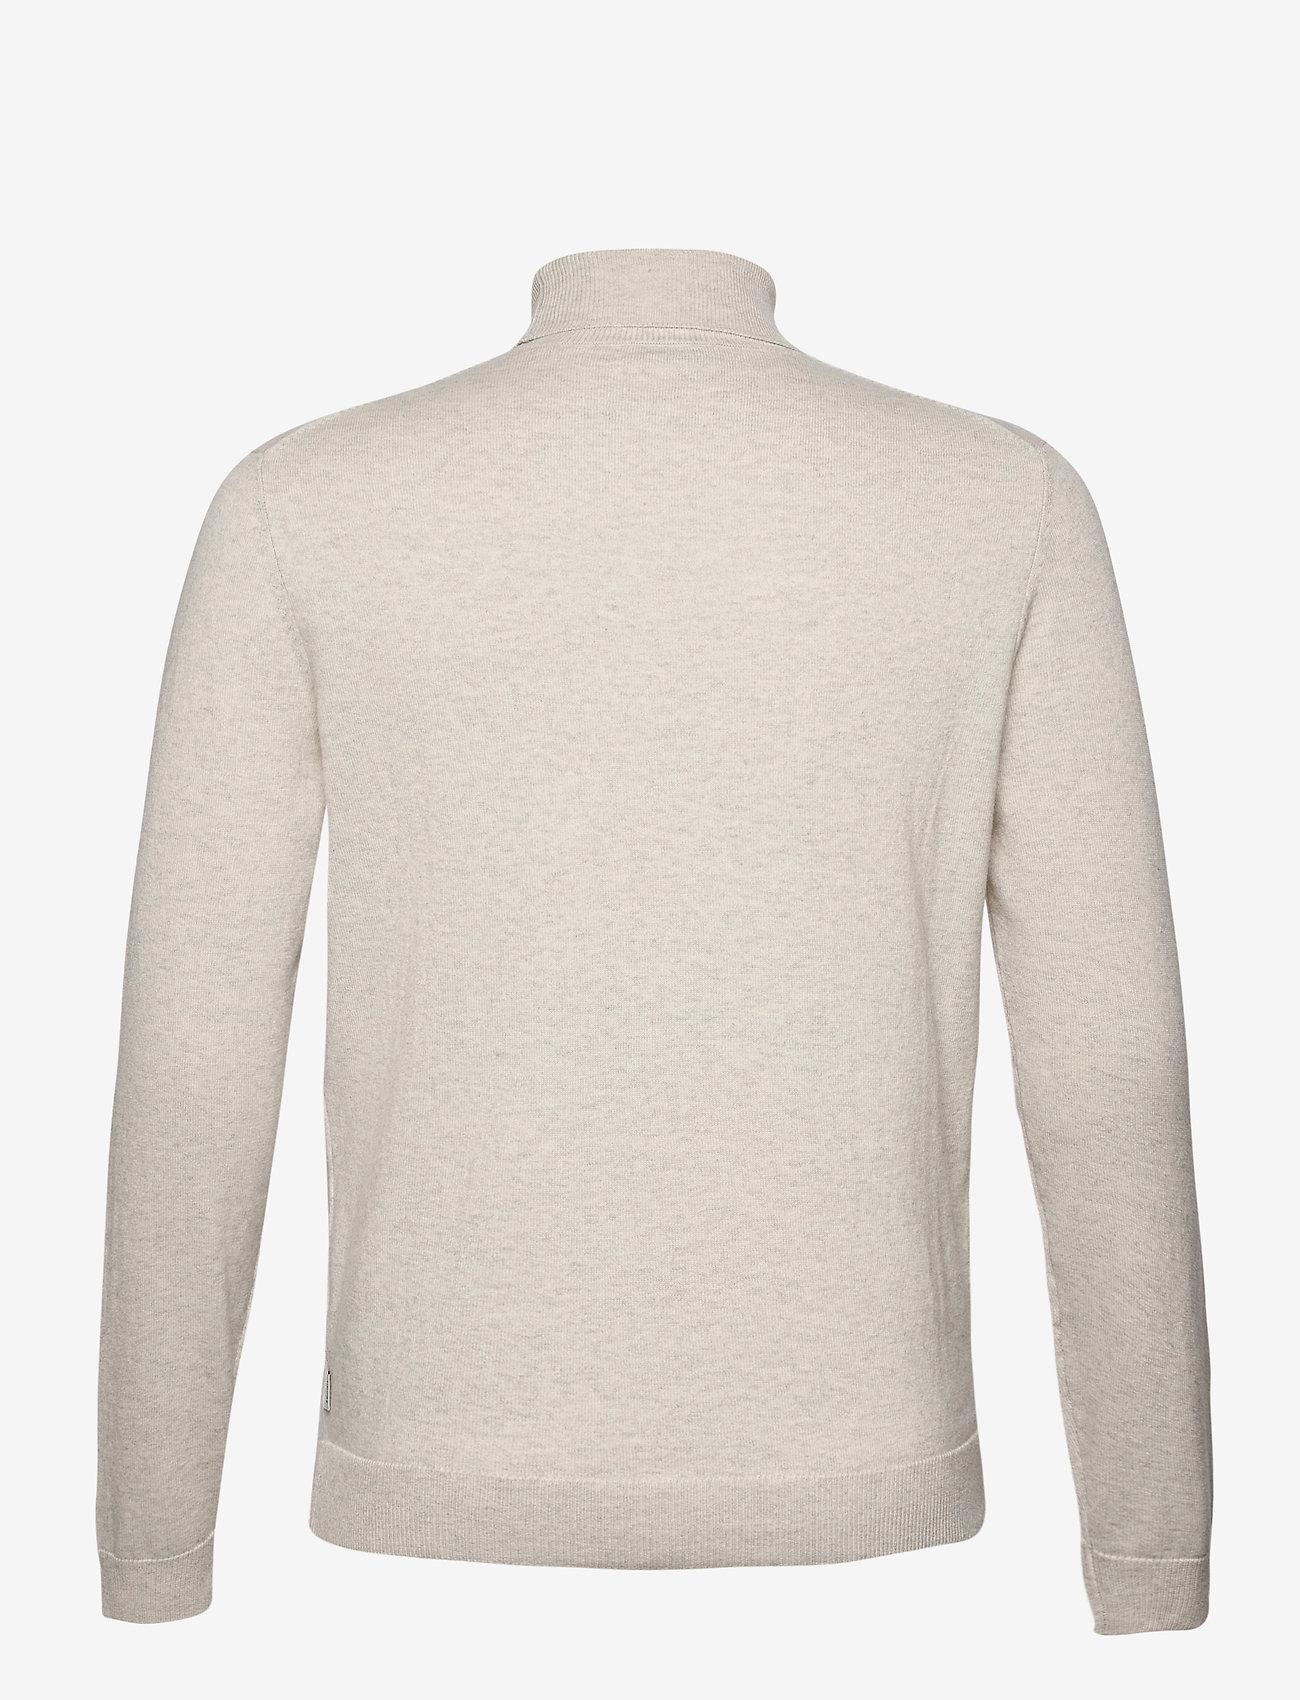 Esprit Casual - Sweaters - tricots basiques - light beige 5 - 1